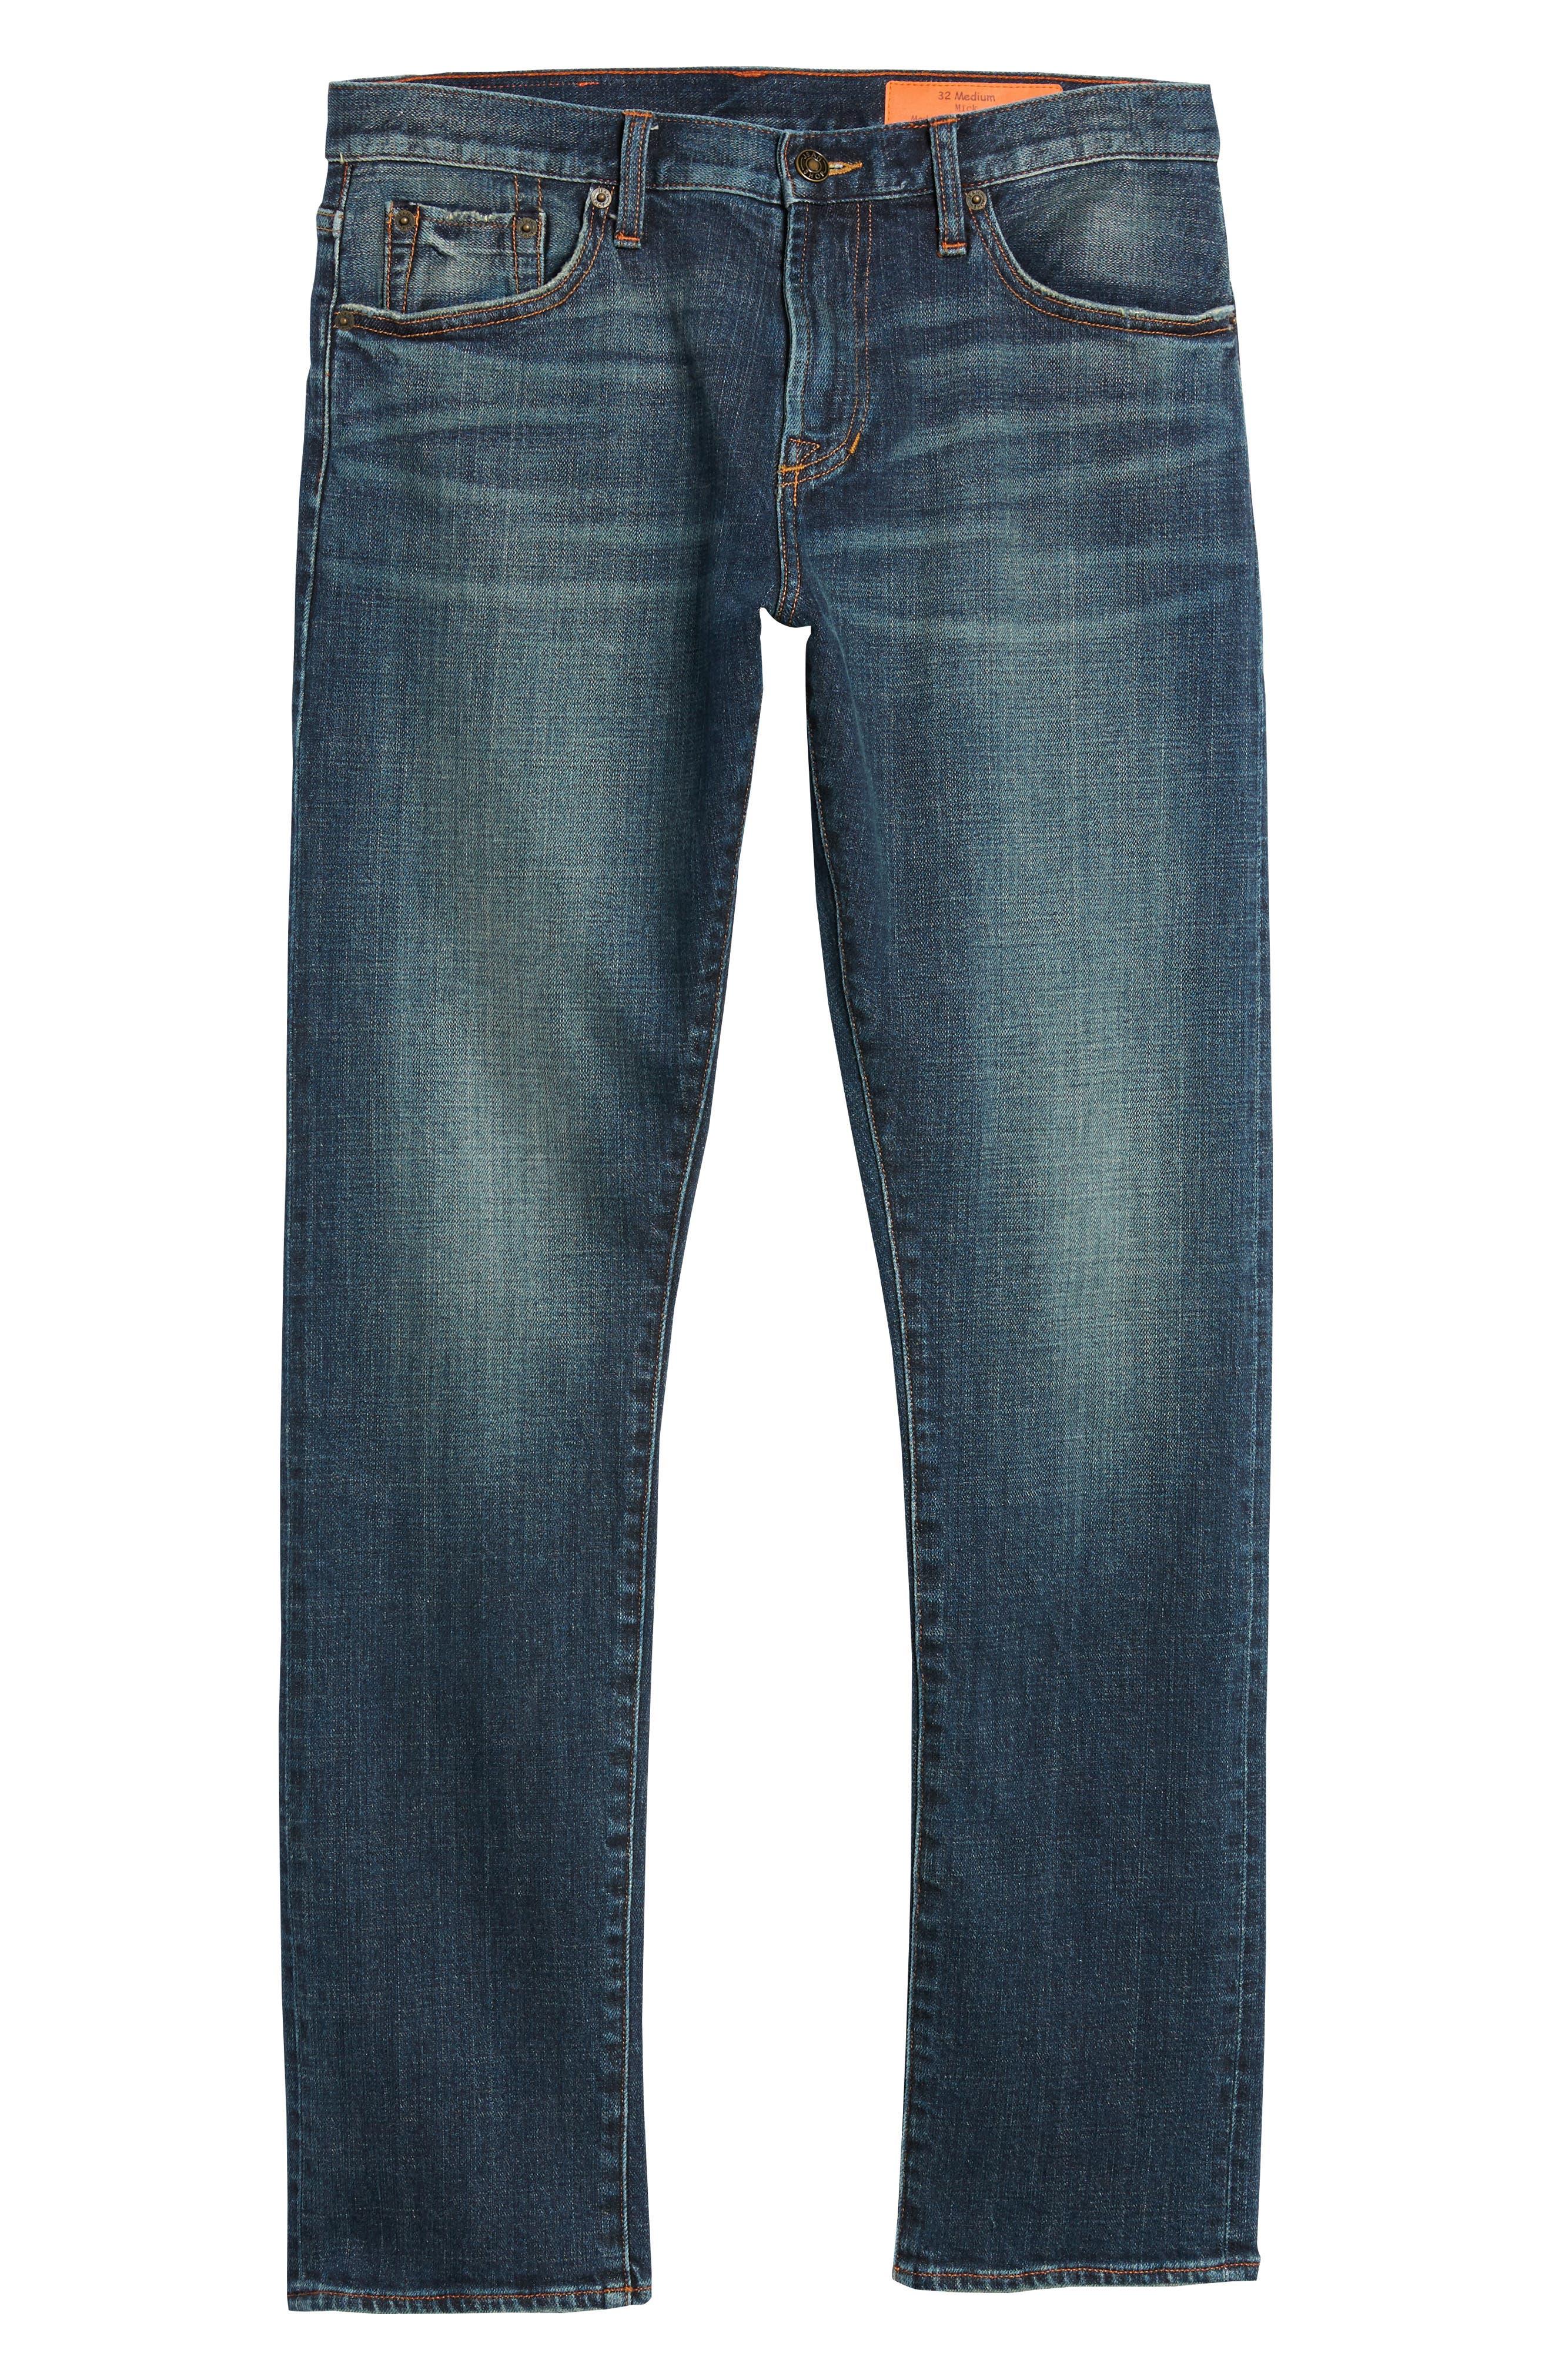 Mick Slim Straight Leg Jeans,                             Alternate thumbnail 6, color,                             Filmore